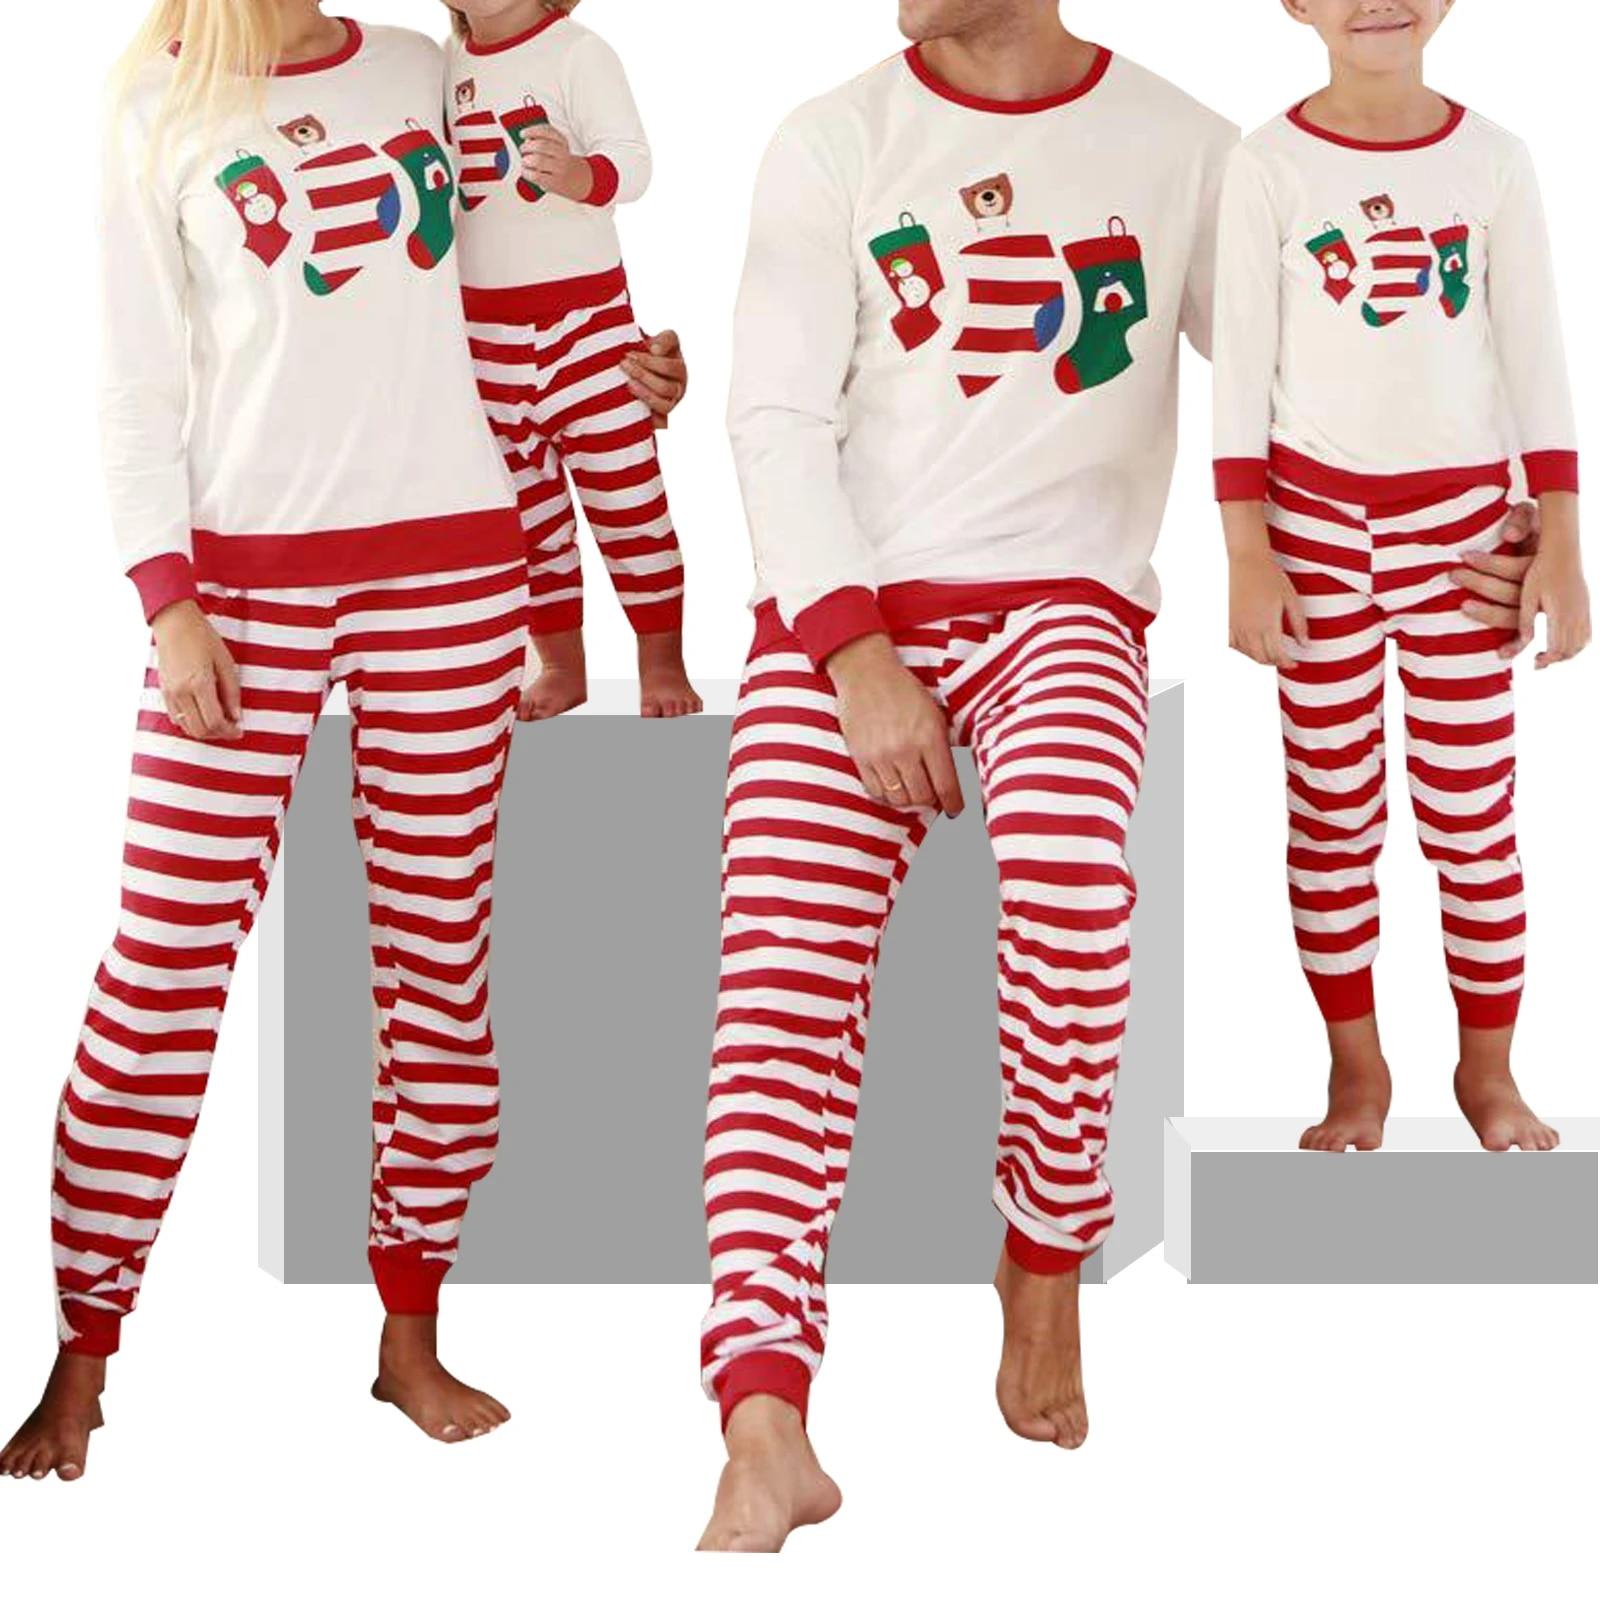 Christmas Xmas Family Matching Set Pajamas Nightwear Kid Adult Striped Sleepwear